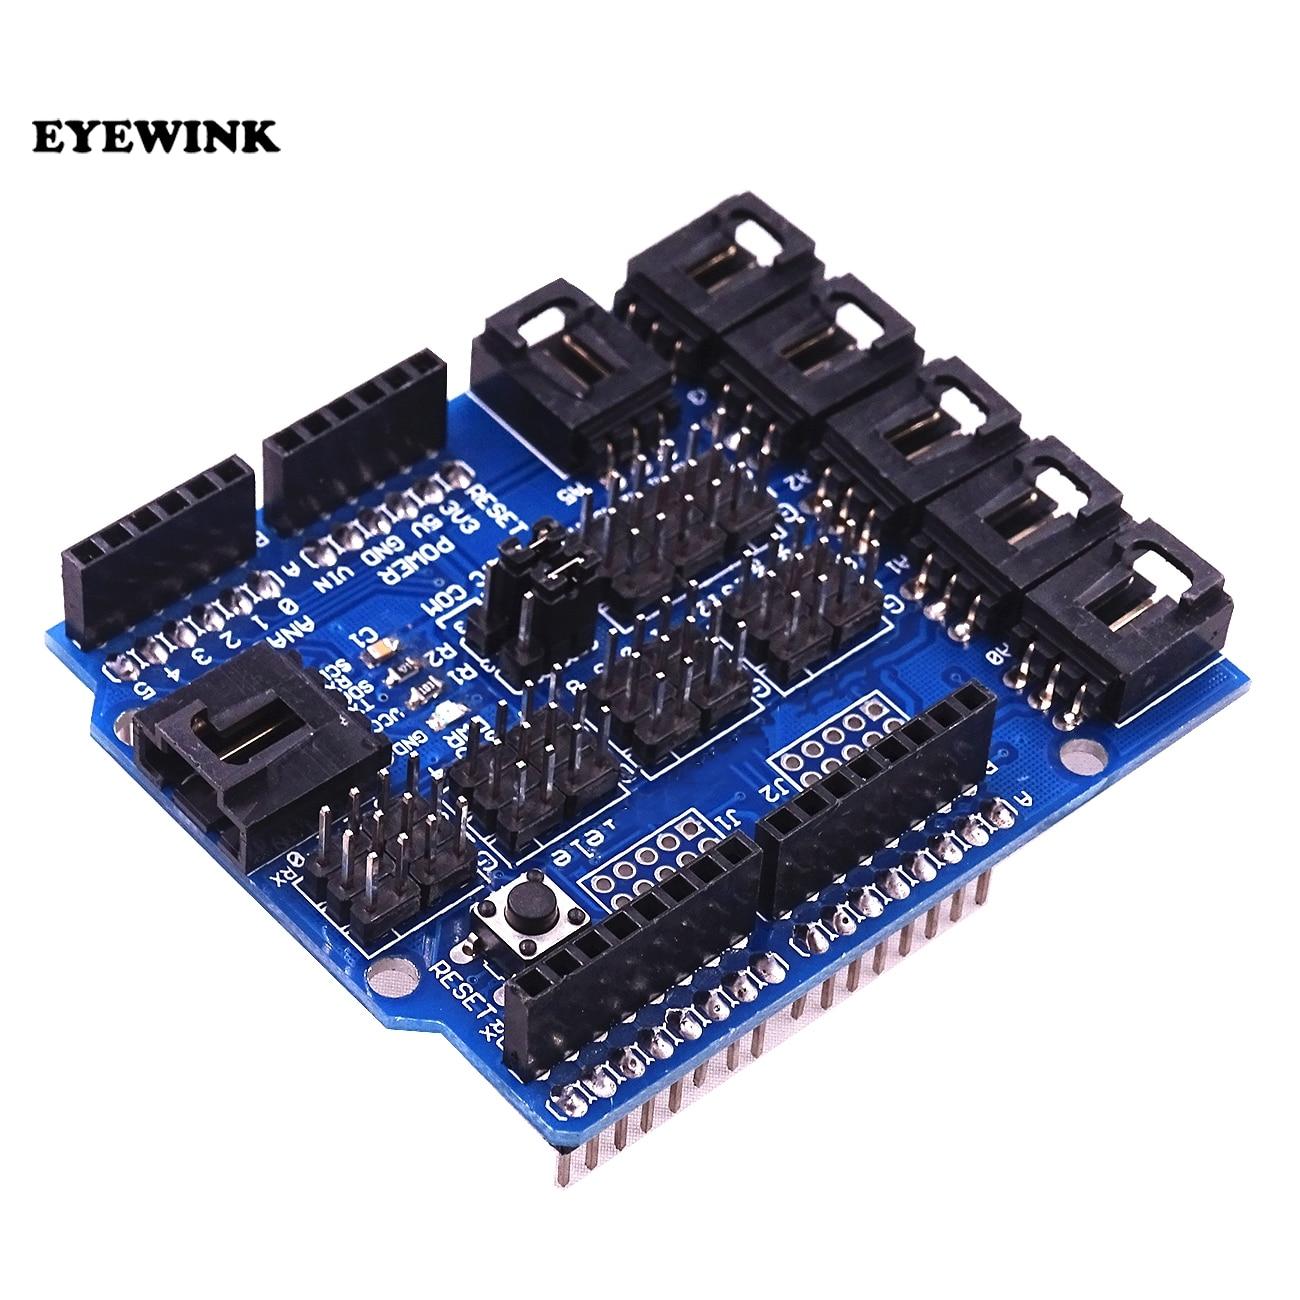 Eyewink sensor shield v digital analog module extension